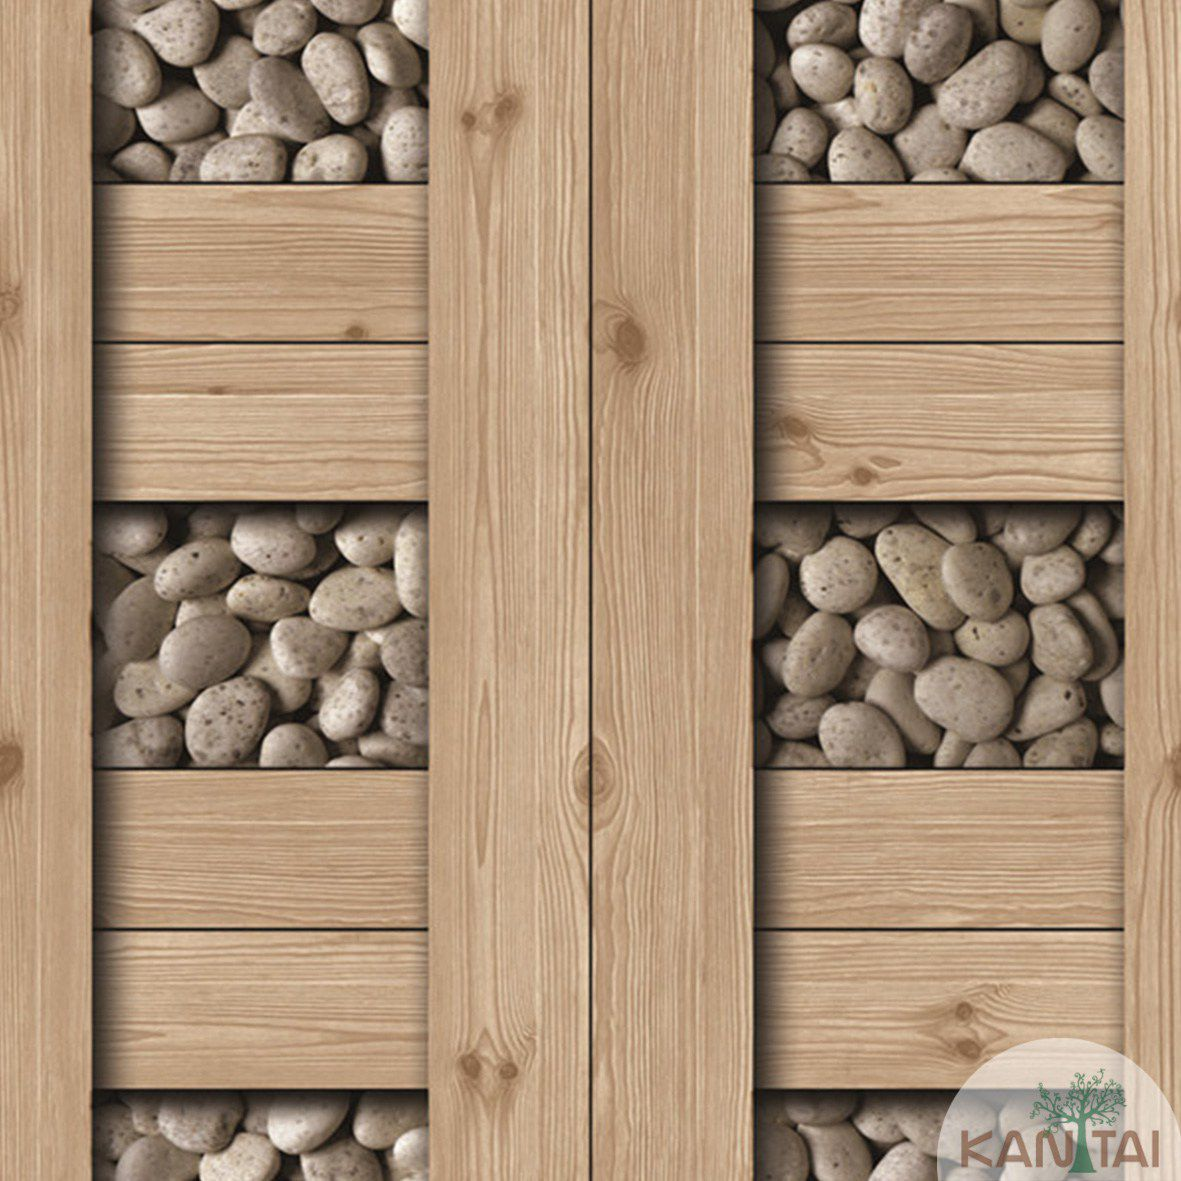 Papel de Parede  Kan Tai  Vinilico Coleção Neonature III 3D Tábuas, Pedras, Marrom Claro, Branco